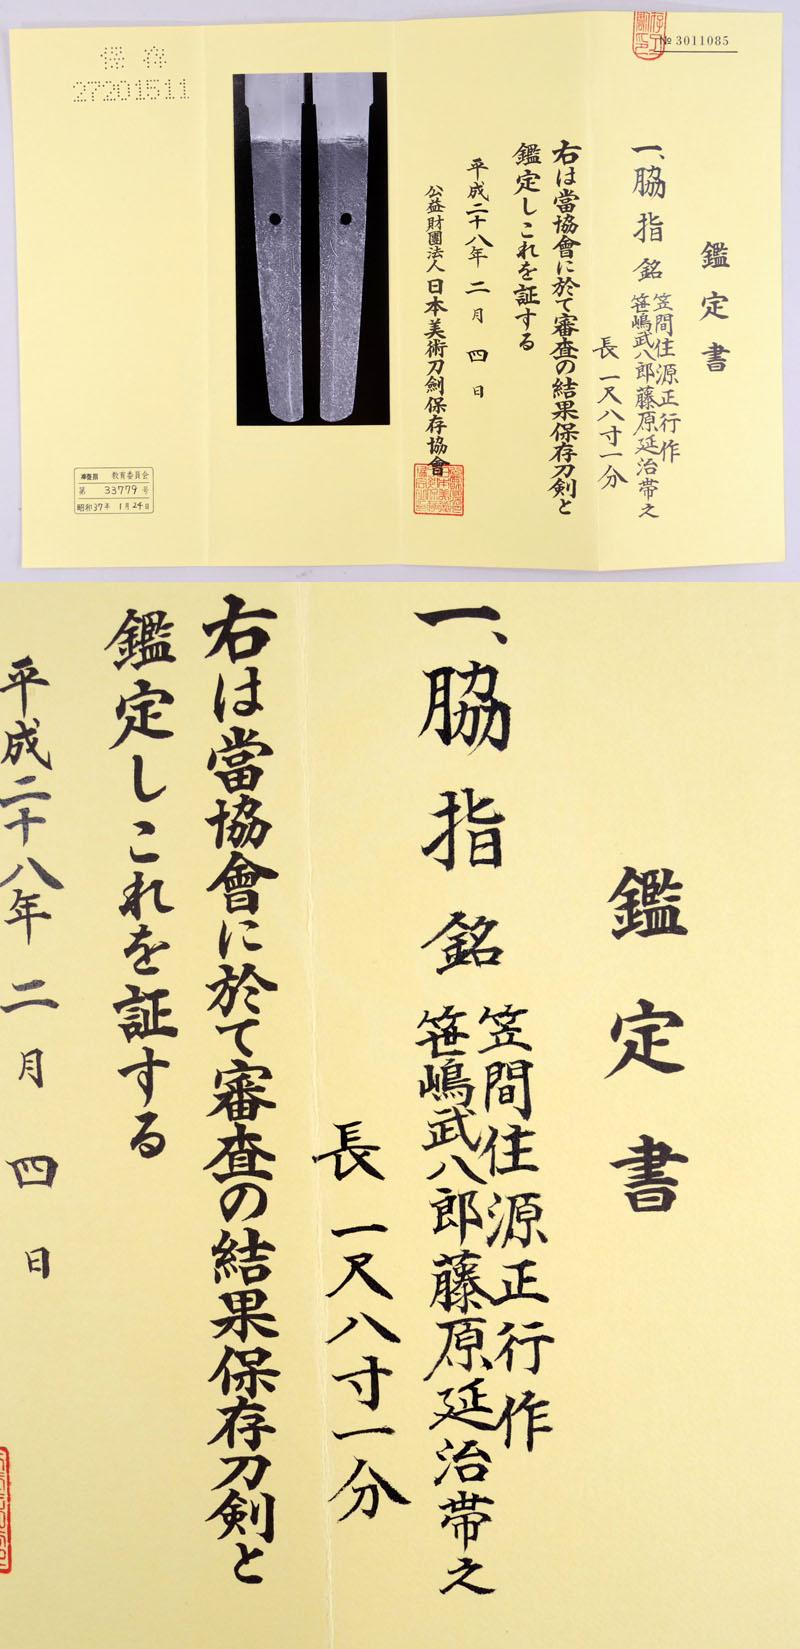 笠間住源正行作(笠間藩工) Picture of Certificate